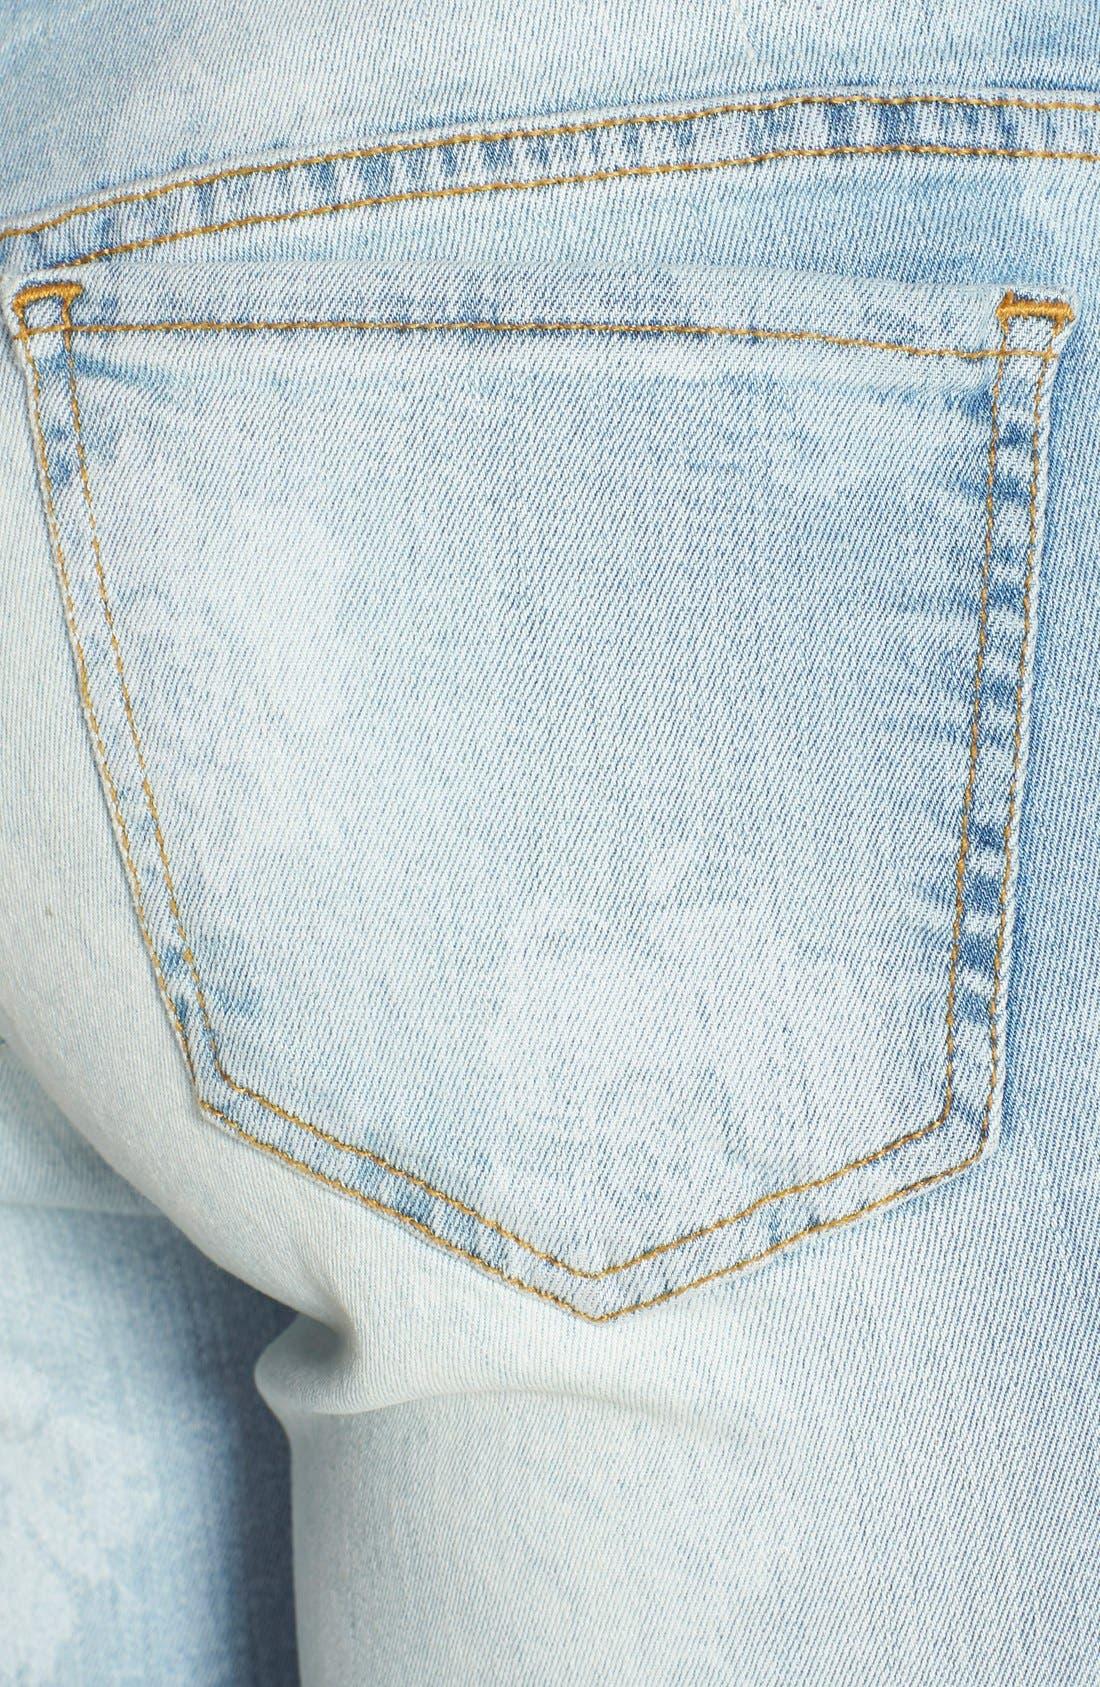 Alternate Image 3  - Volcom 'Liberator' Print Skinny Jeans